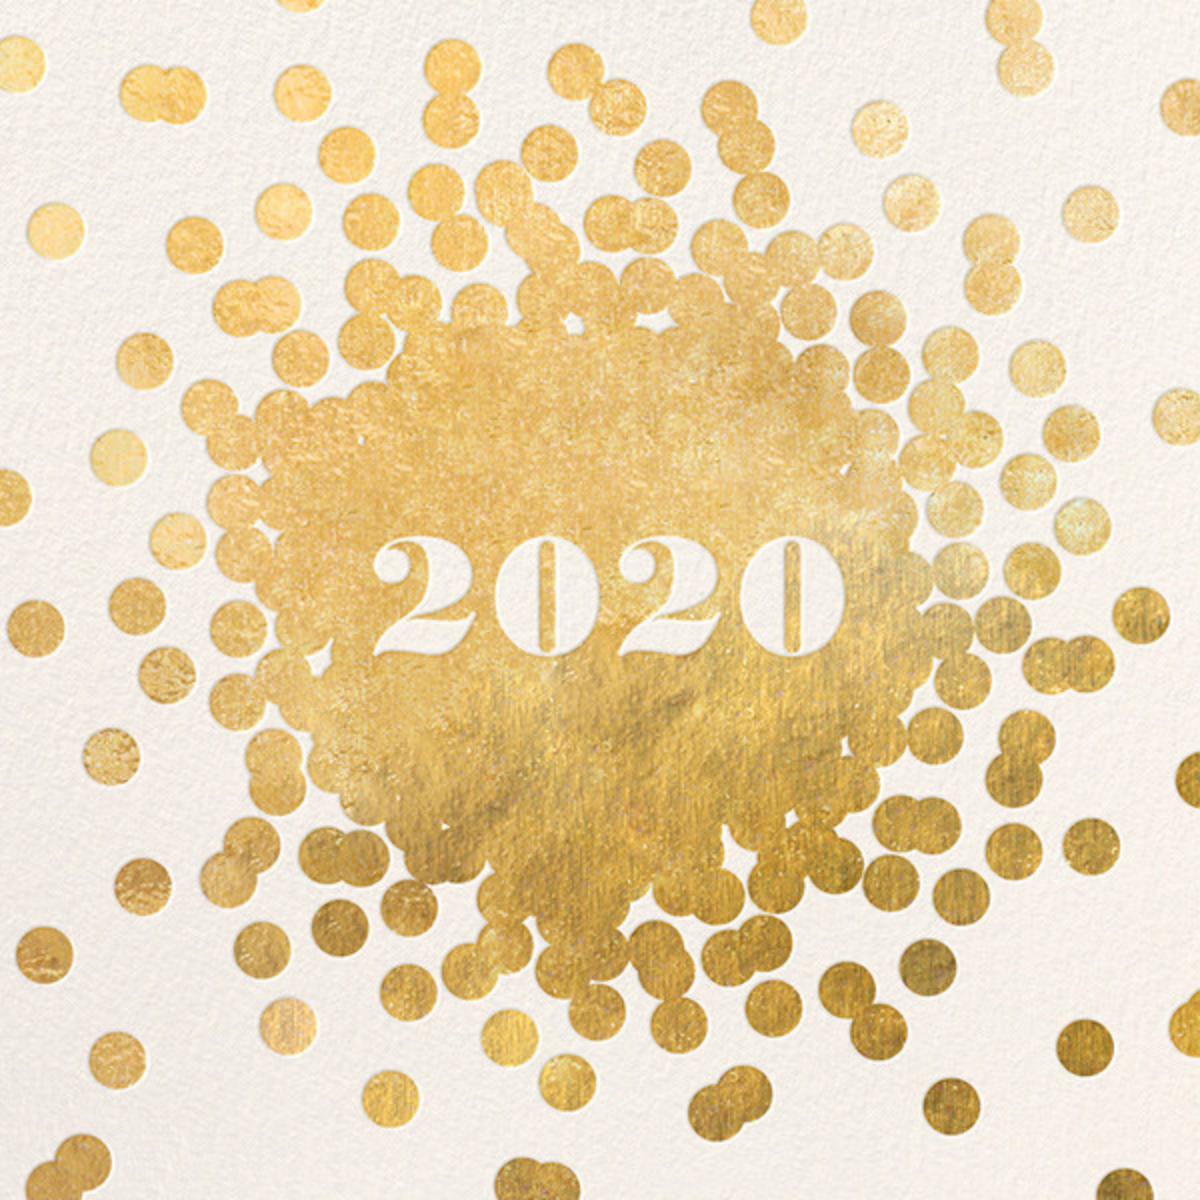 Confetti New Year (Greeting) - Gold/Cream - kate spade new york - New Year